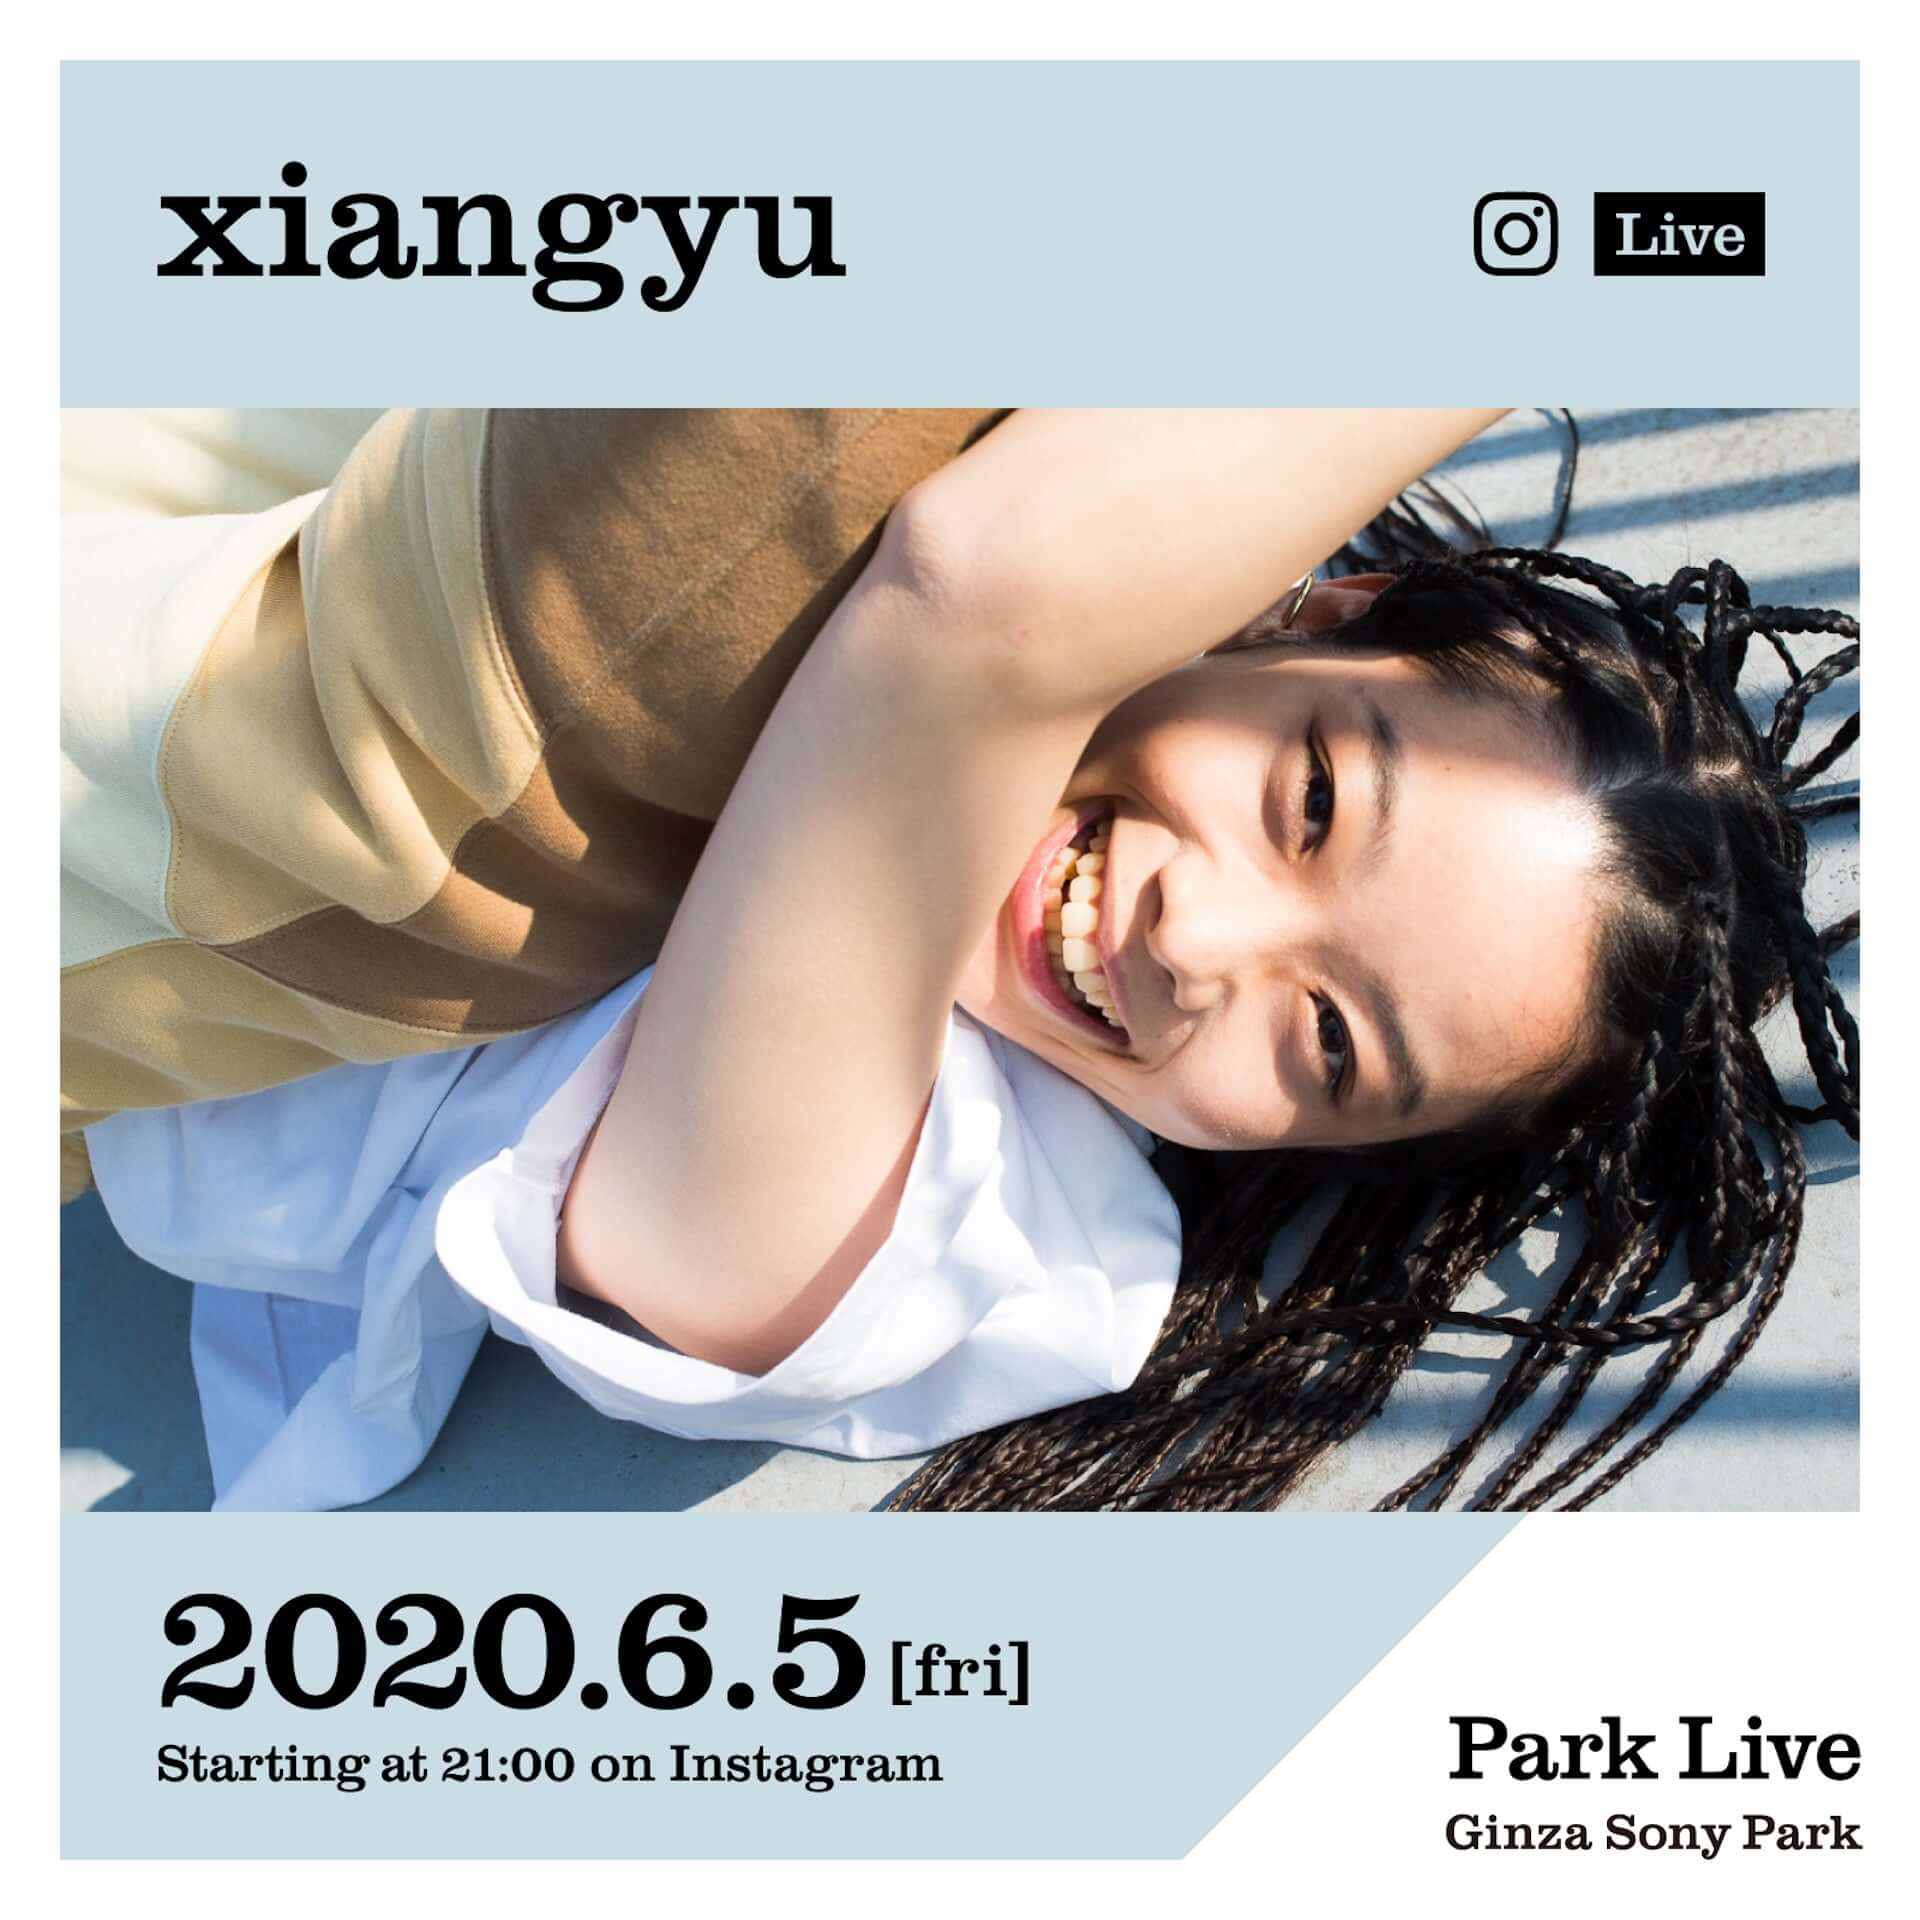 Ginza Sony Park<Park Live>配信ライブにxiangyuが登場!配信当日2nd EP『きき』もリリース music200602_parklive_01-1920x1920